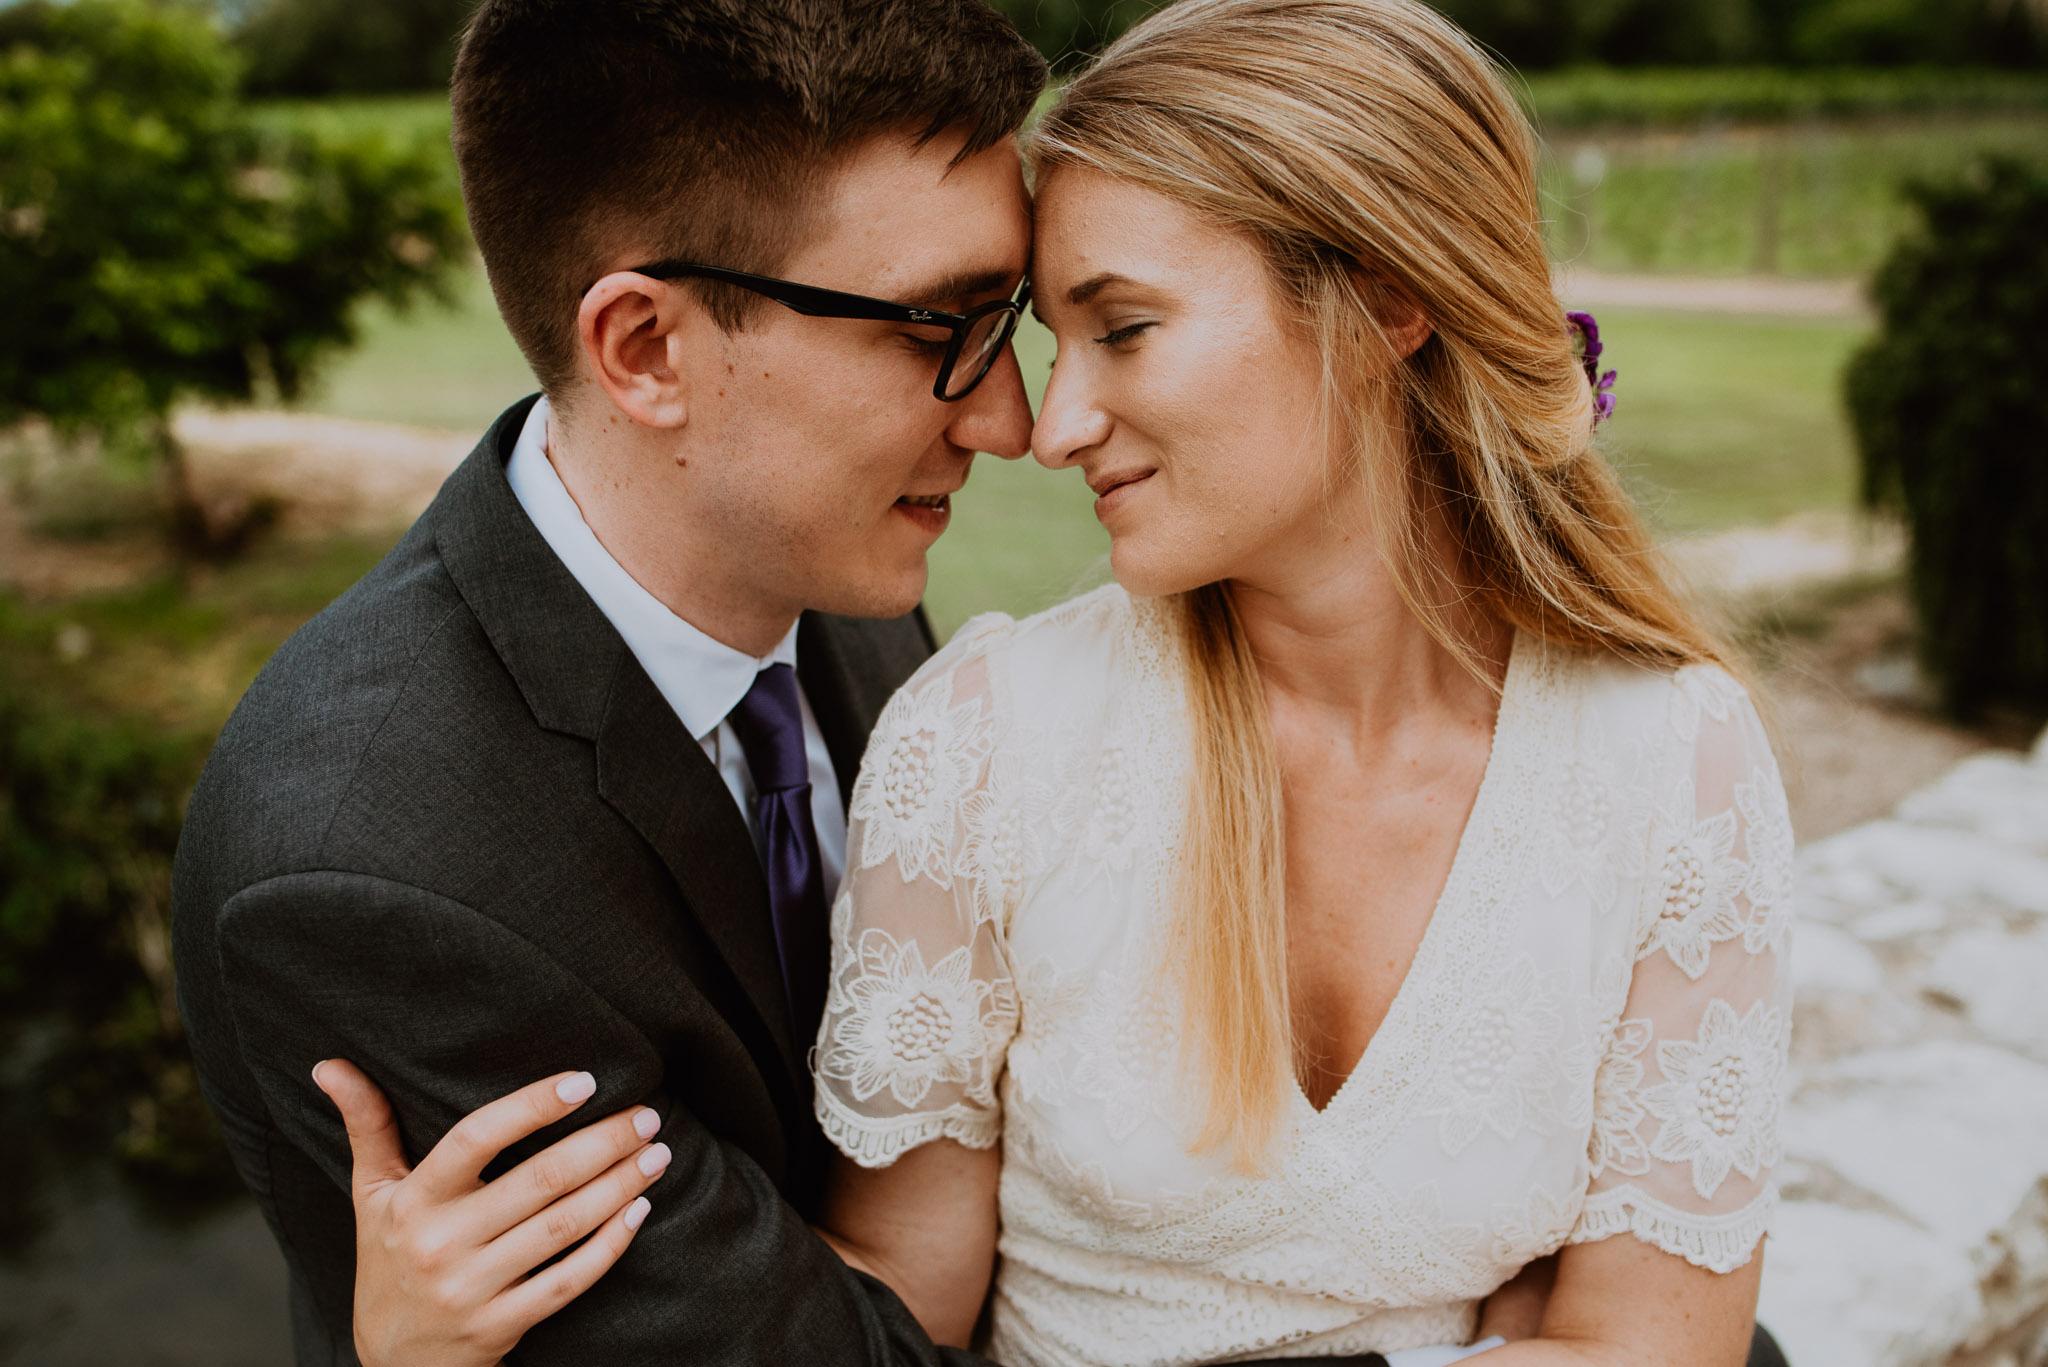 Christoval-vineyard-wedding-heather-justin-0025.jpg